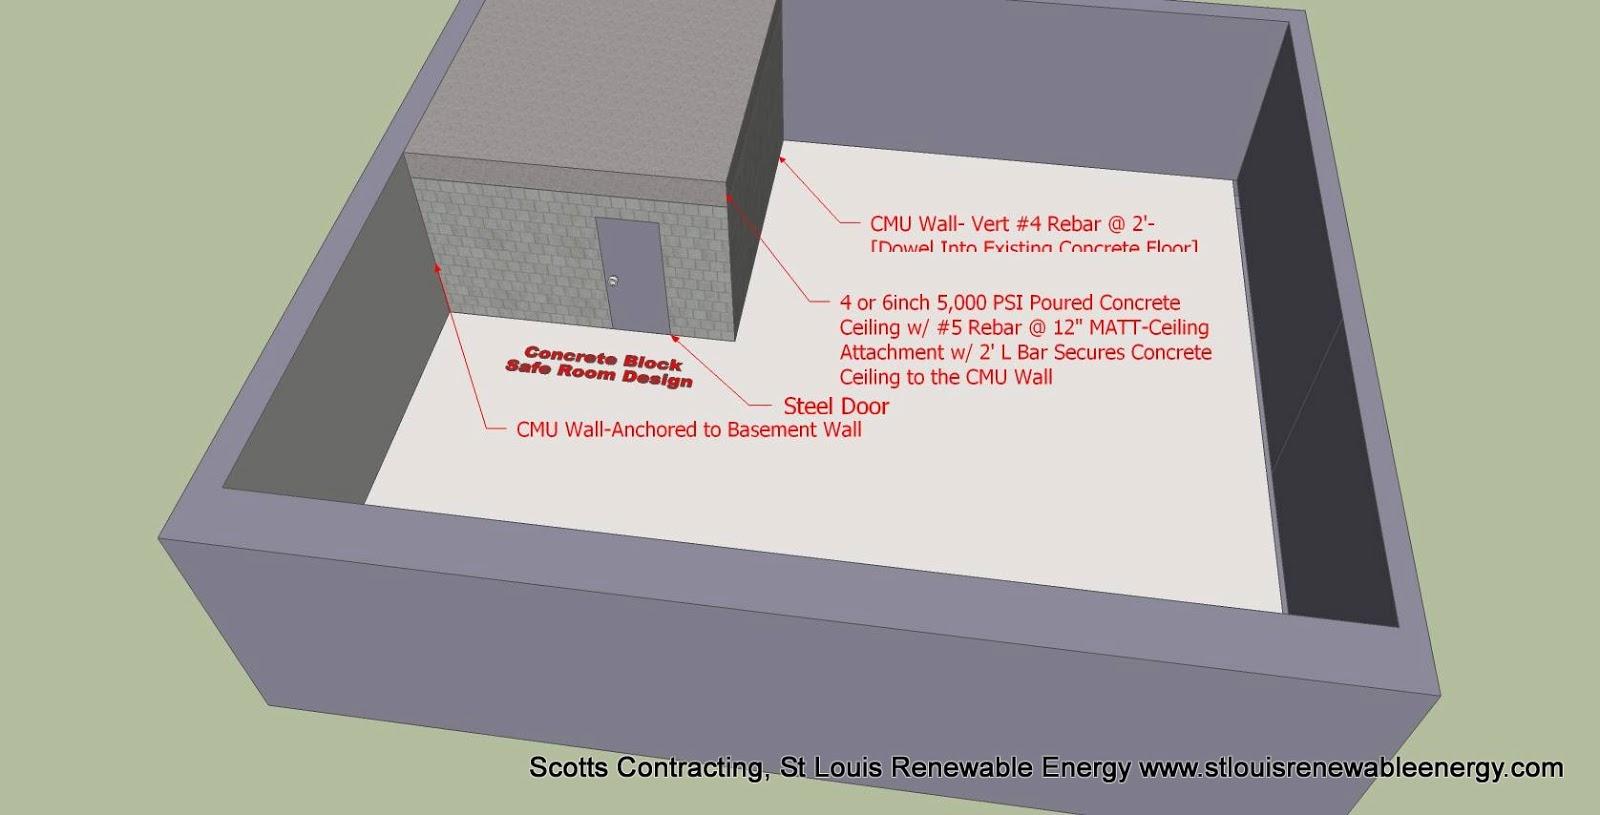 Tornado Safe Room Design Scotts Contracting St Louis